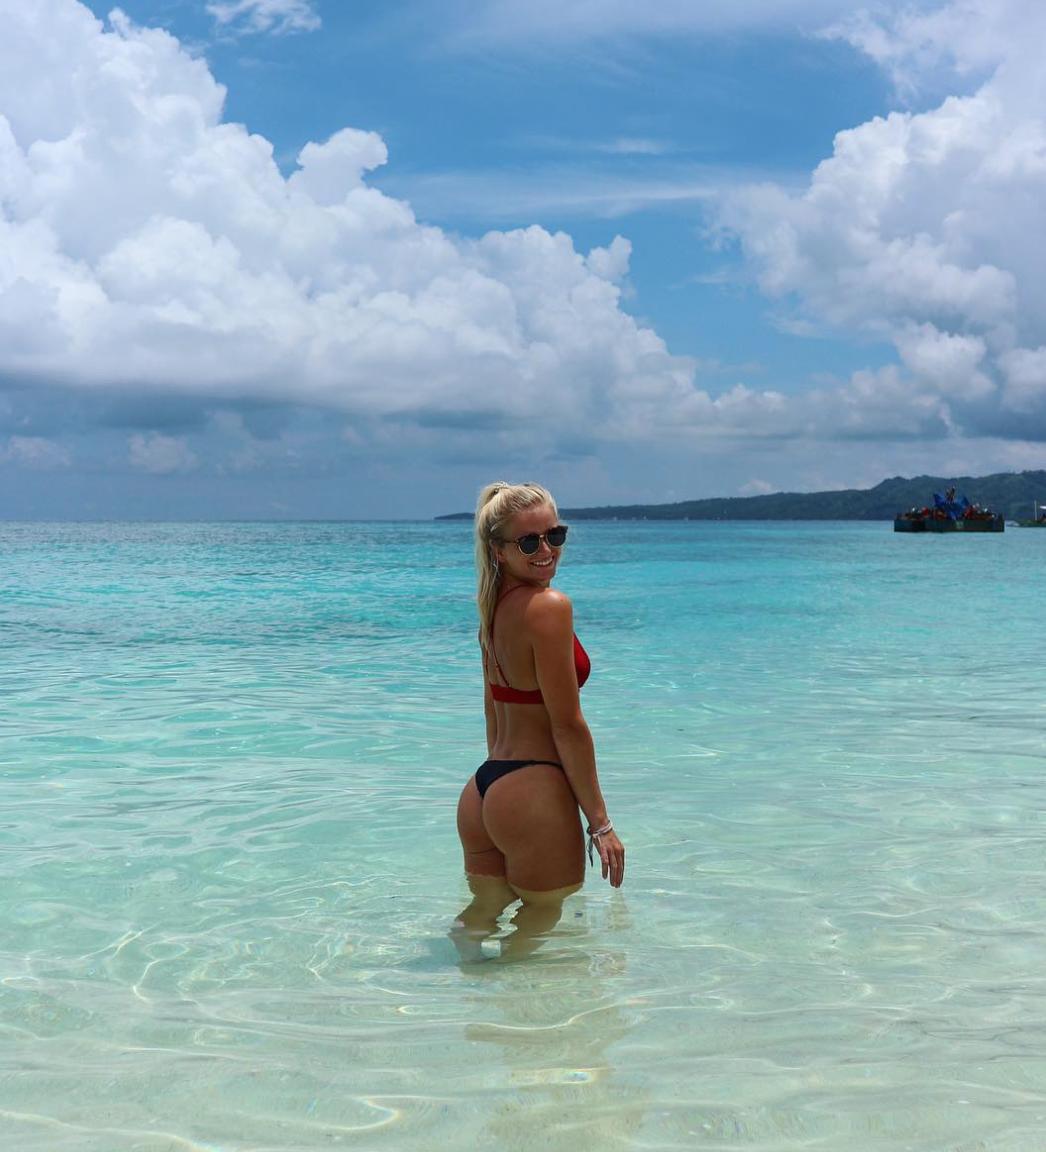 It's more fun in the Philippines -  Puka Beach, Boracay